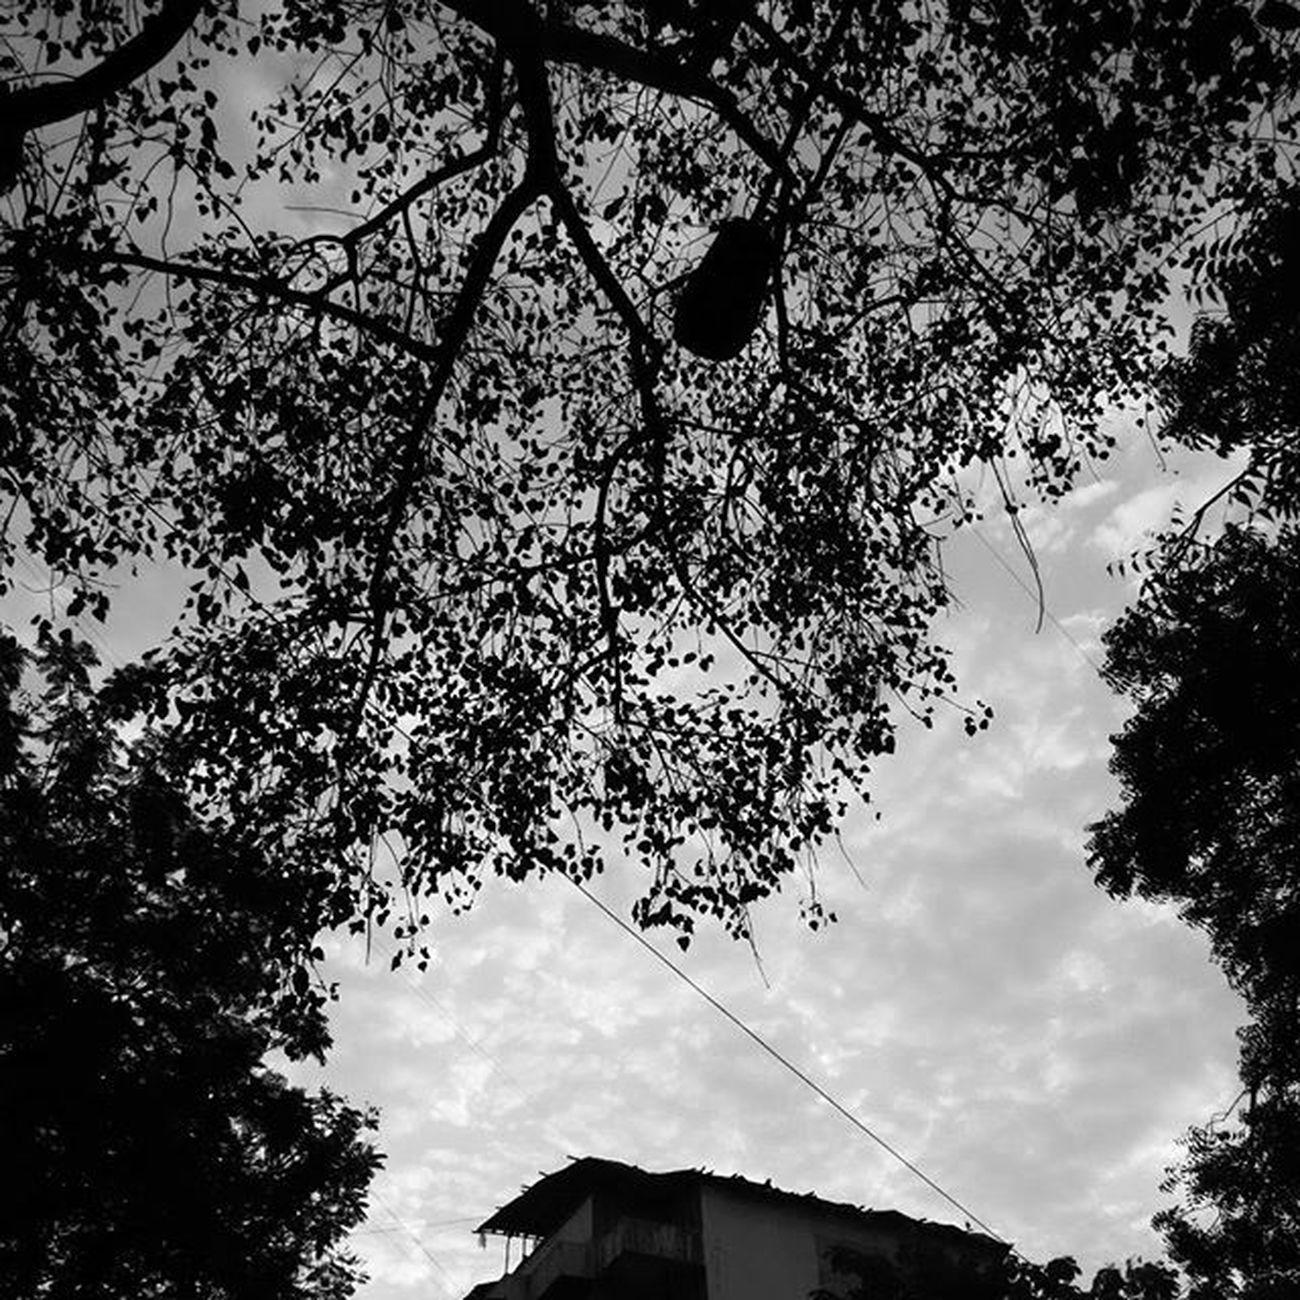 Morningclicks Amazingsky Clouds Justperfect LoveNature Beautifulview Black Instaclick Instamood College ...